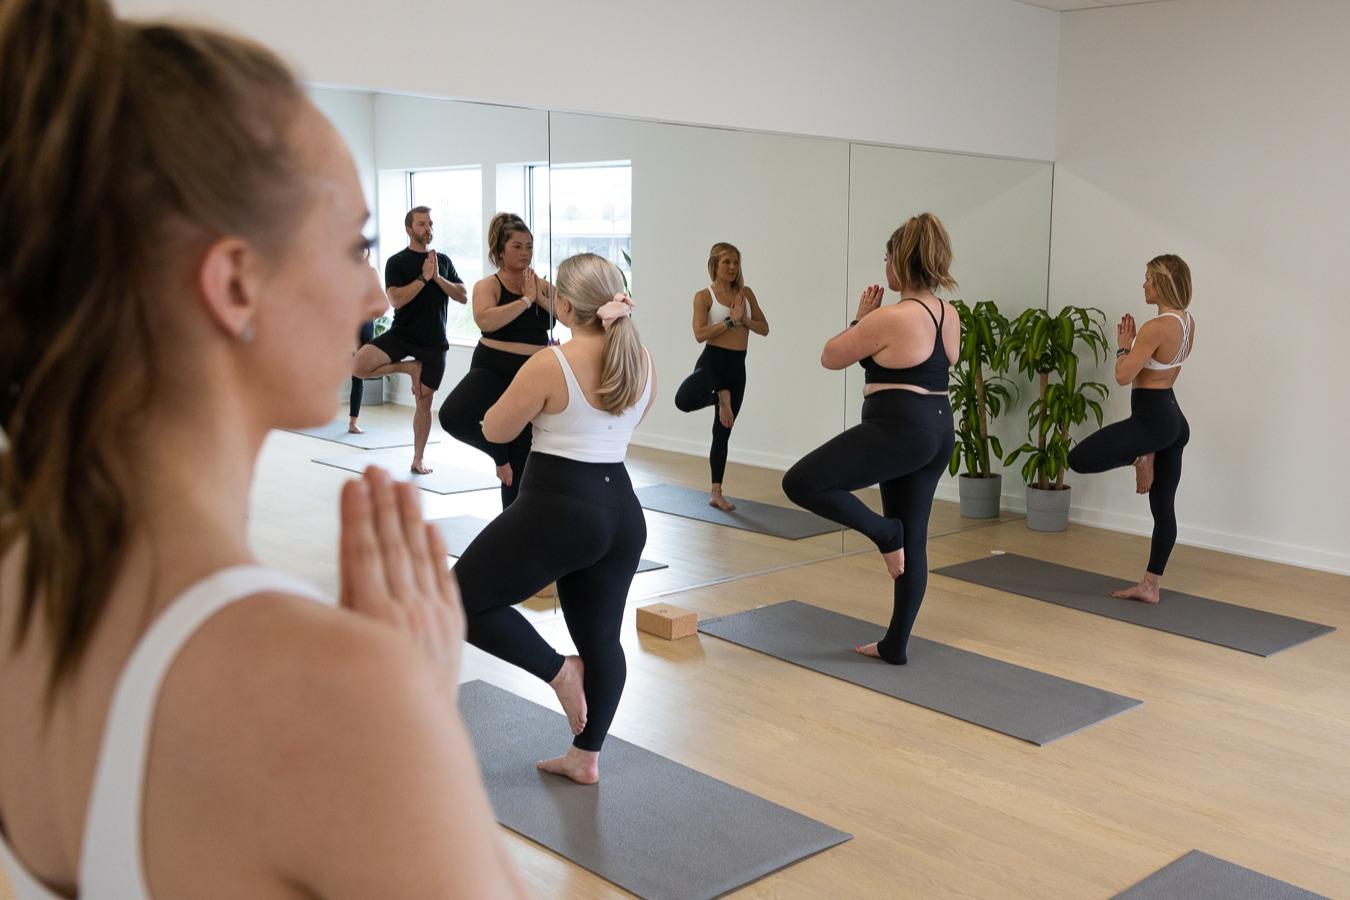 Sweat Shop Hot Yoga Oconomowoc Yoga Group Class 7 Resize